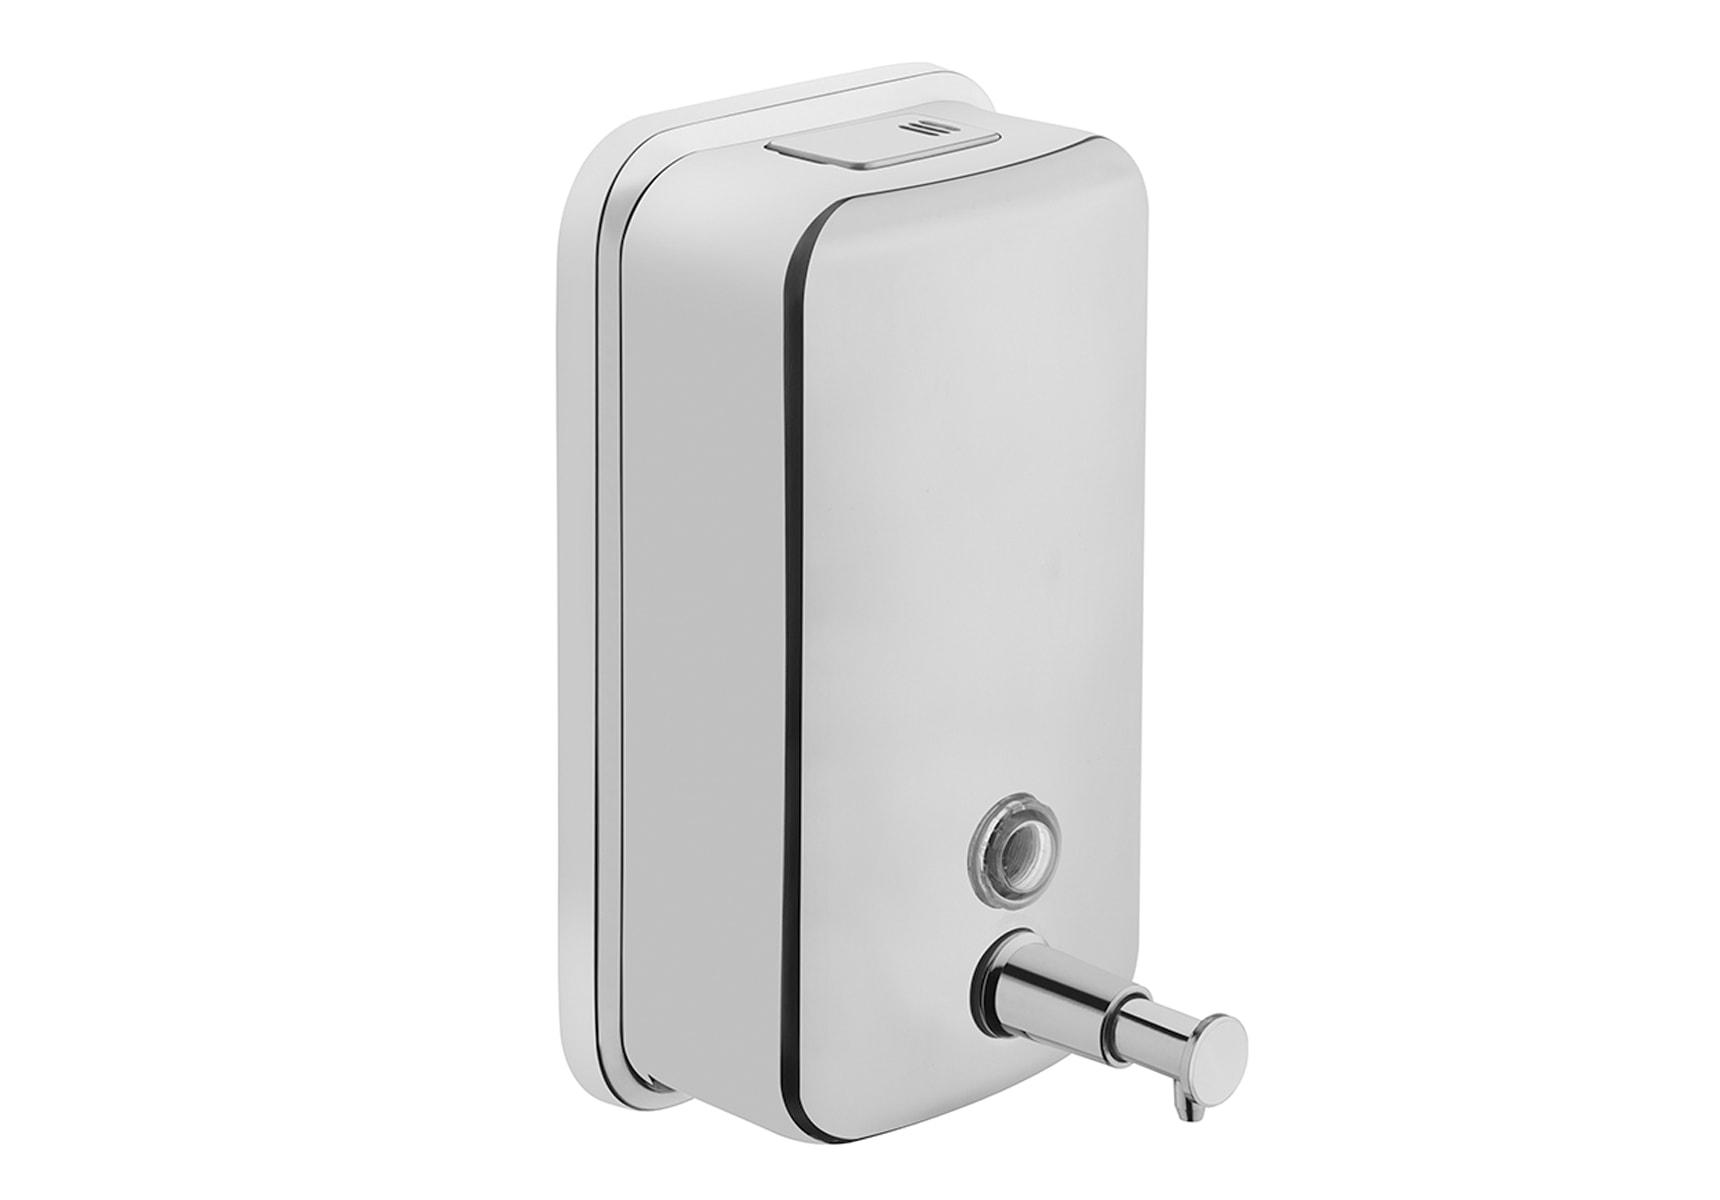 Arkitekt Liquid Soap Dispenser